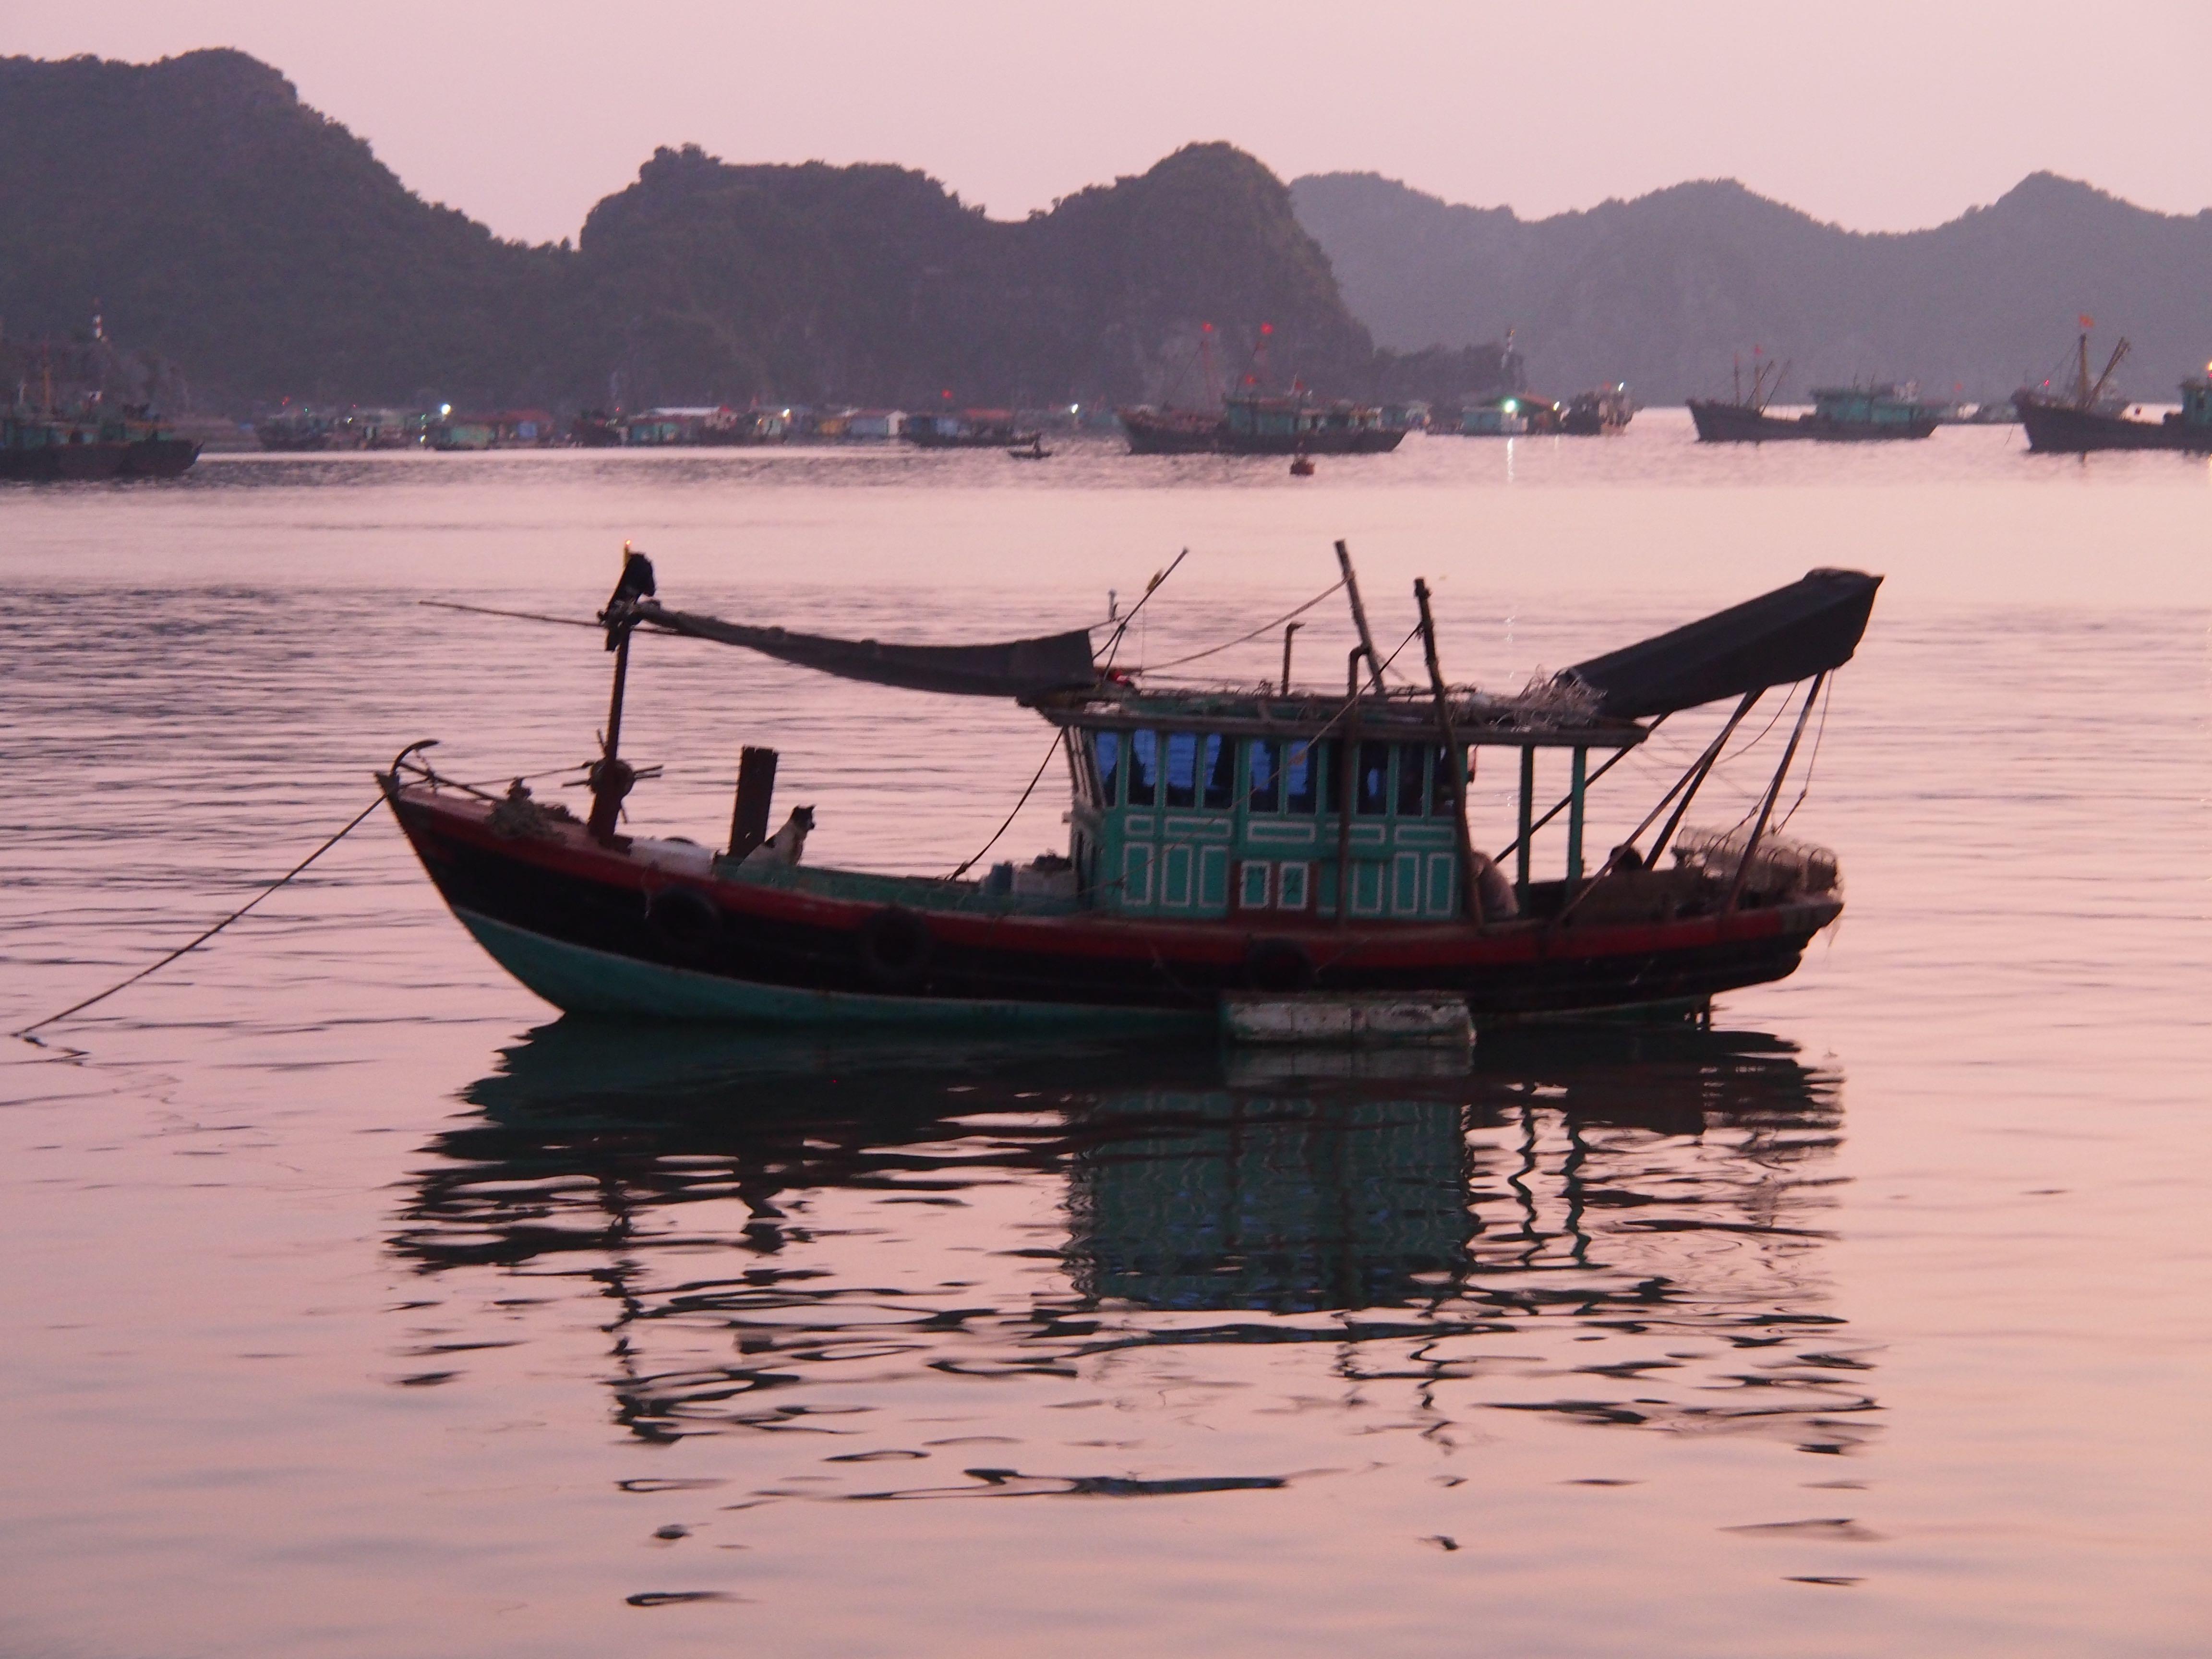 Fishing boat in Halong Bay